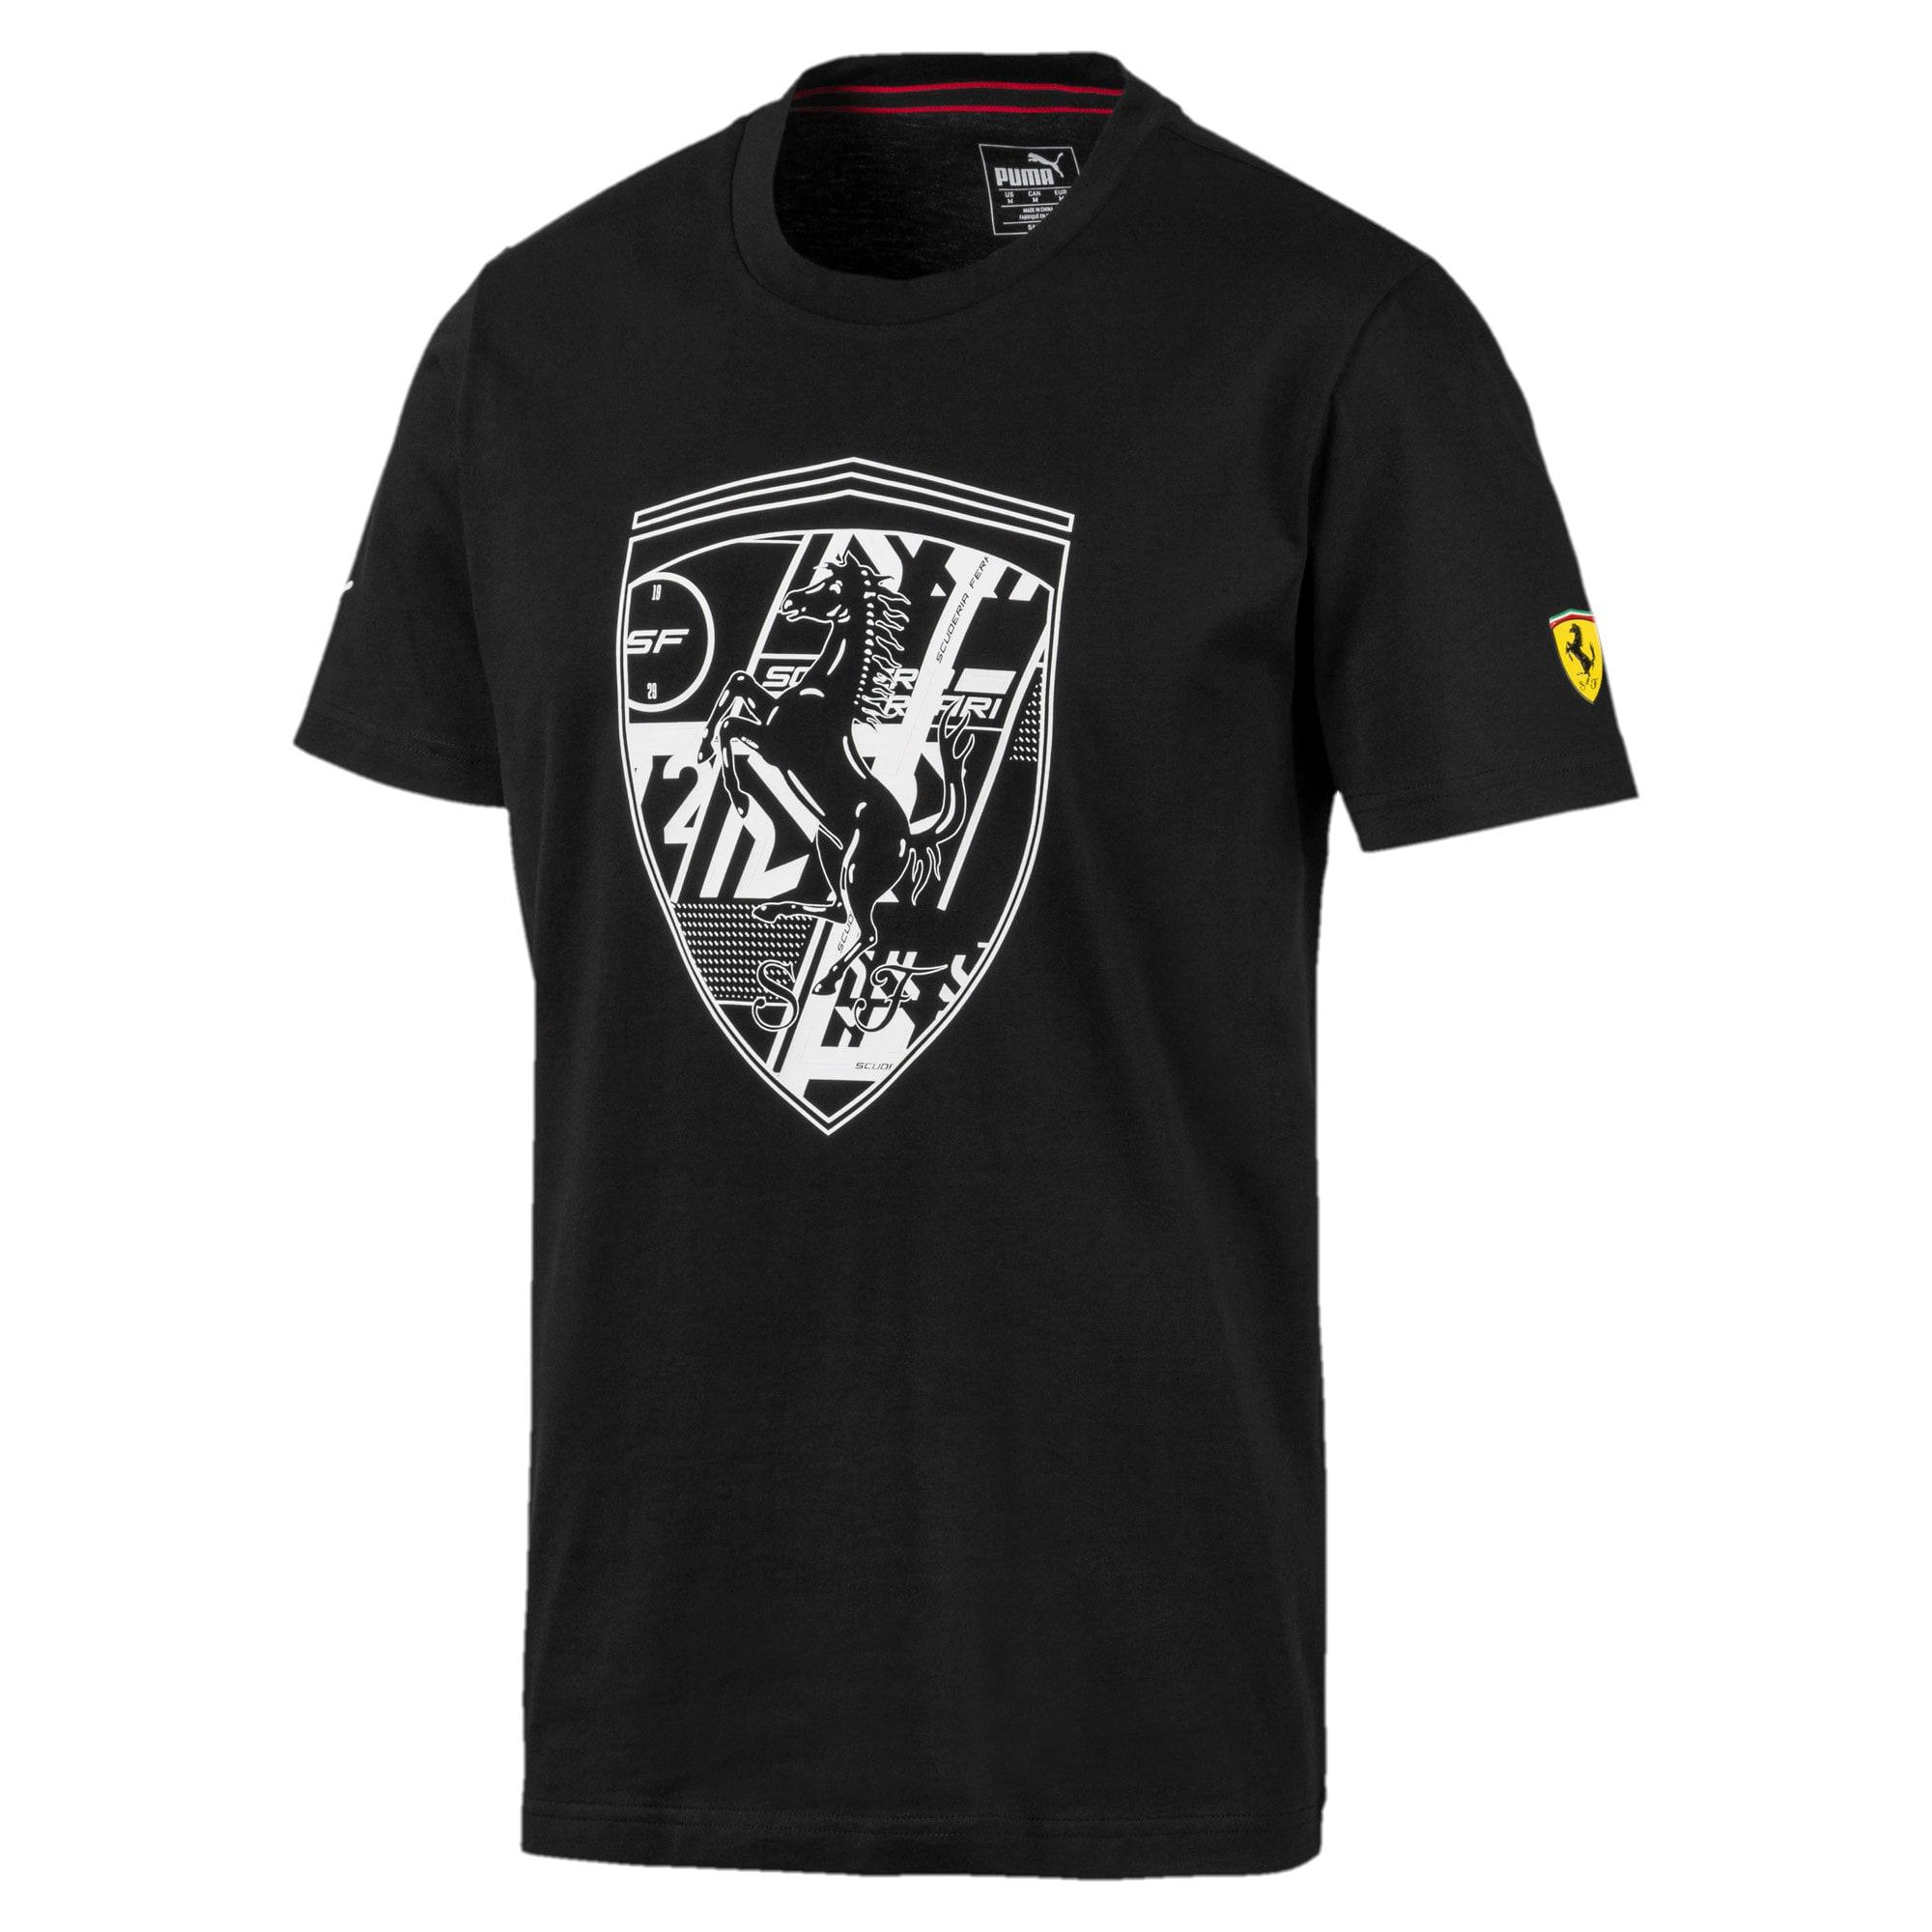 Thumbnail 1 of フェラーリ ビッグシールド Tシャツ + 半袖, Puma Black, medium-JPN